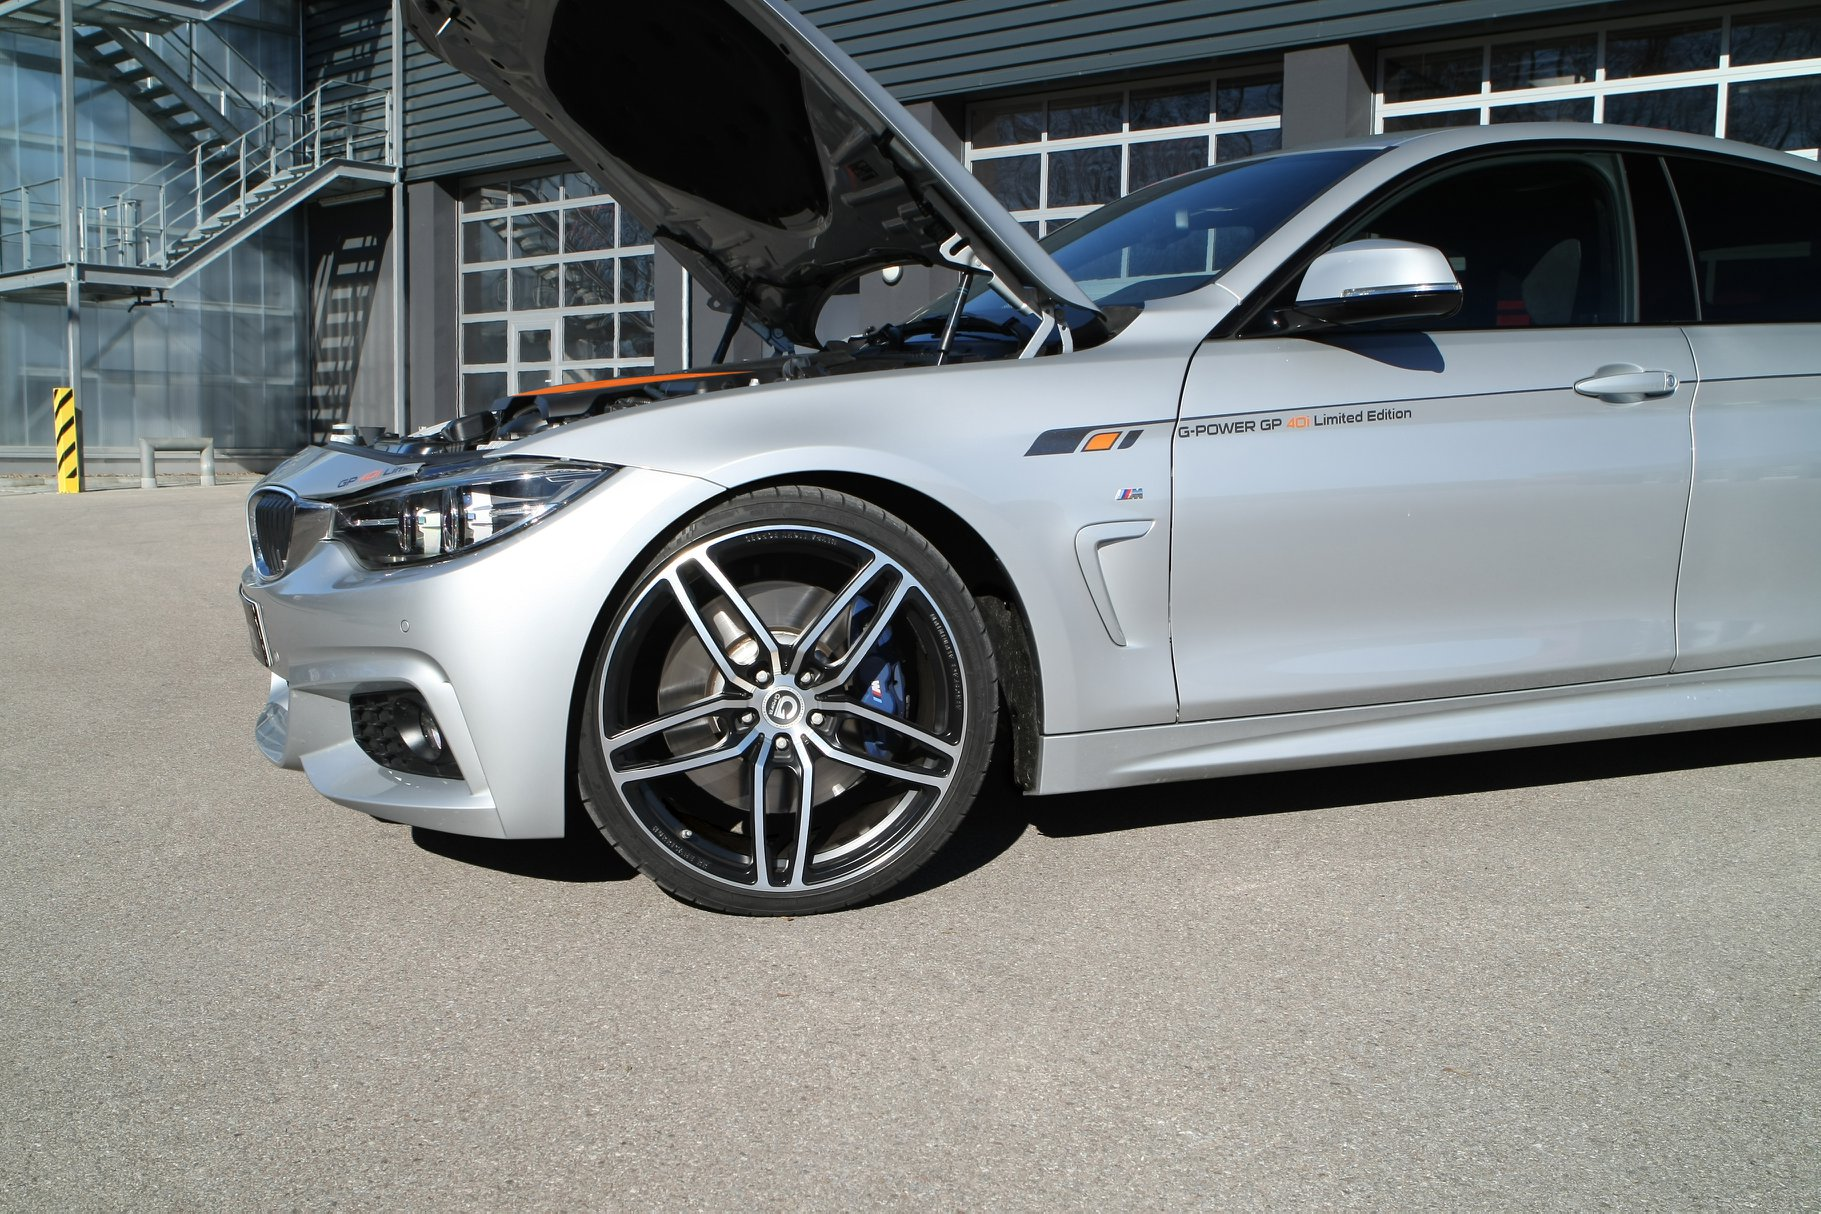 G-Power BMW 440i GP 40i Limited Edition (3)